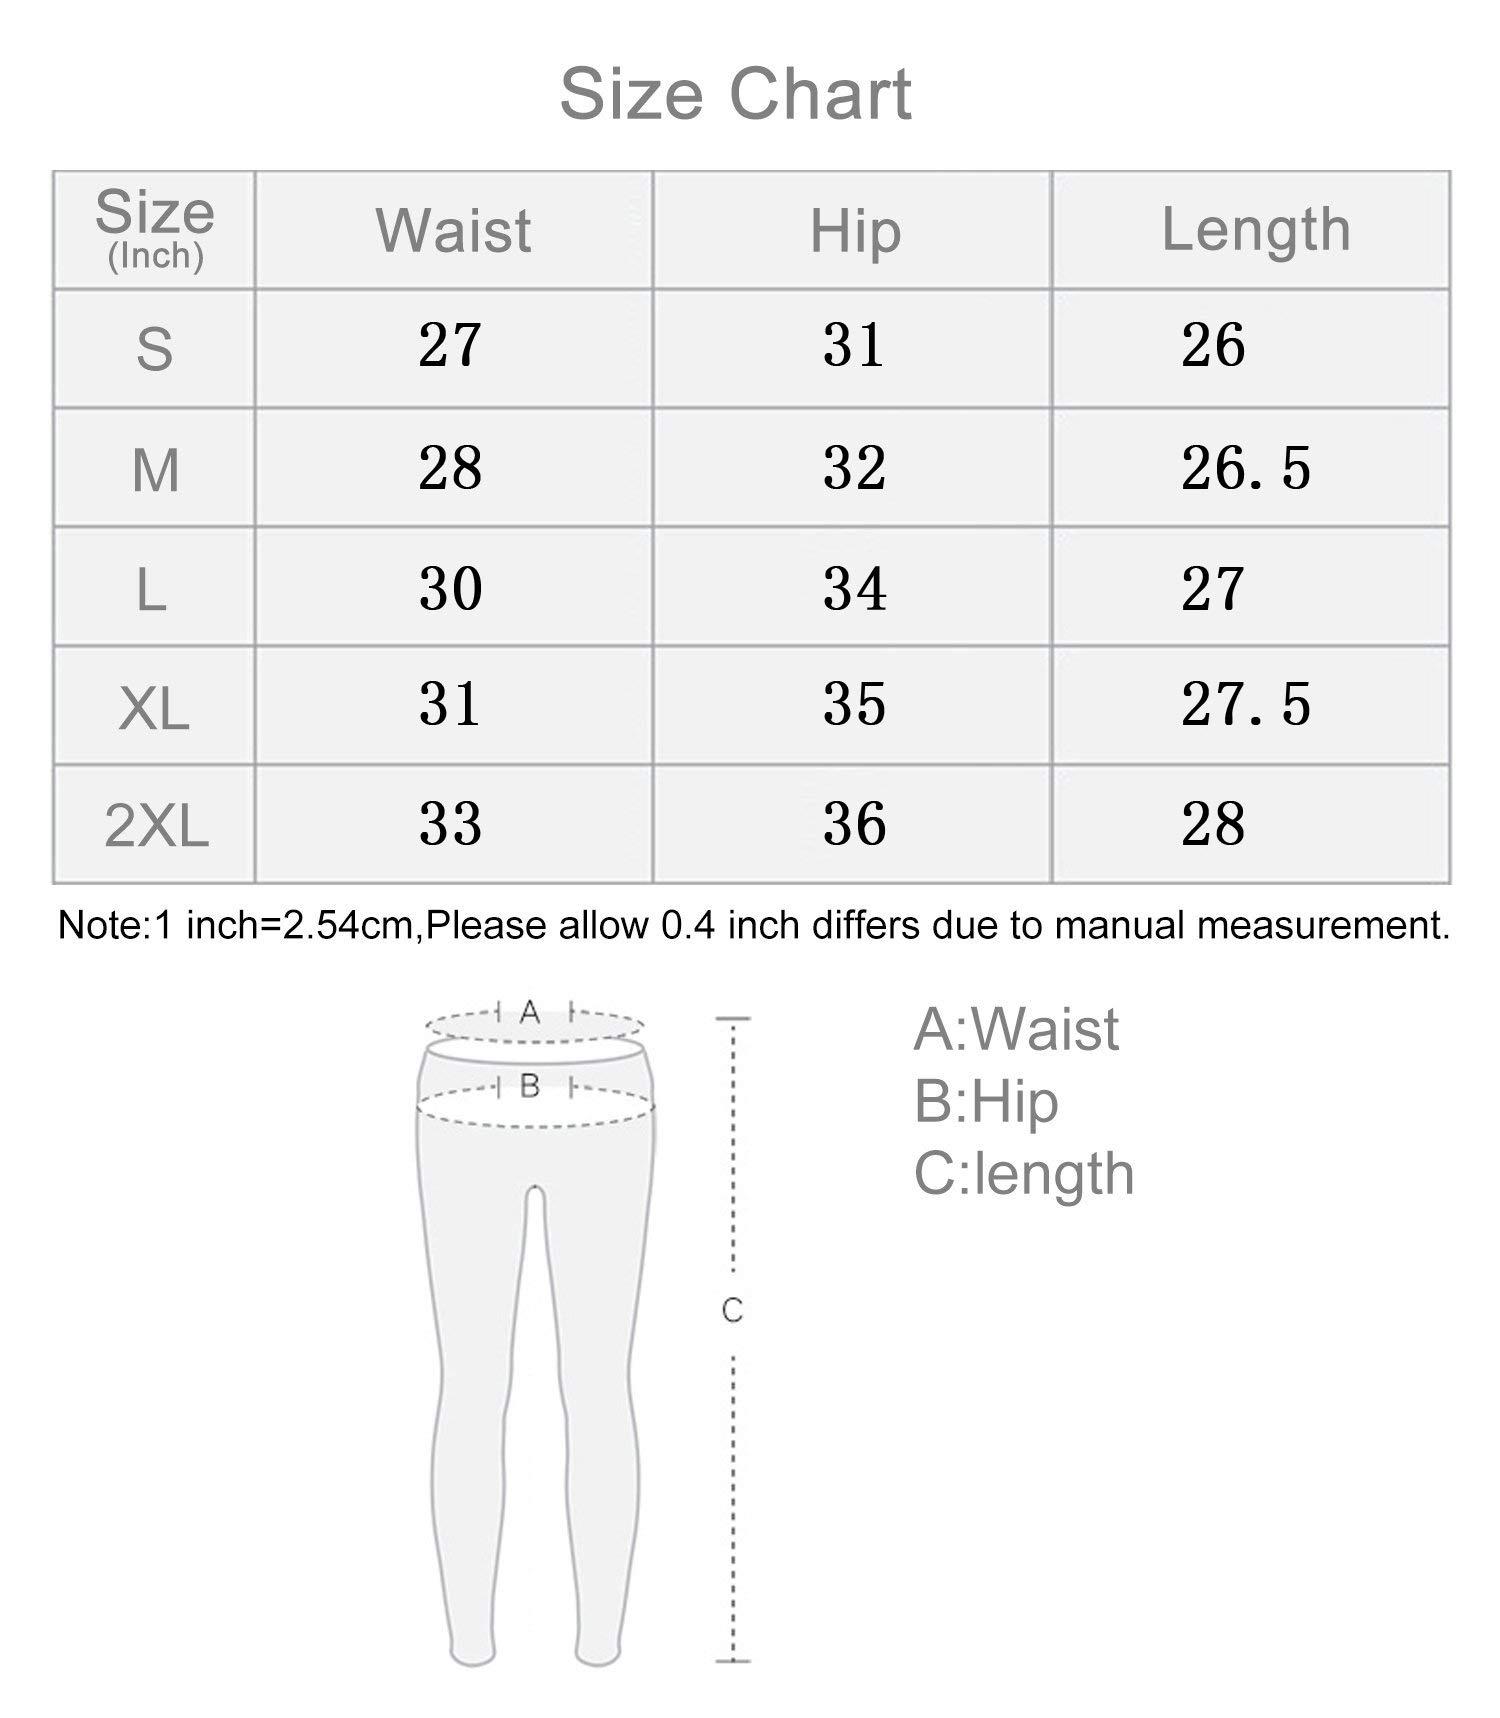 Fengbay Capris Leggings, Capris Yoga Pants Tummy Control Workout Running 4 Way Stretch High Waist Capris Workout Leggings